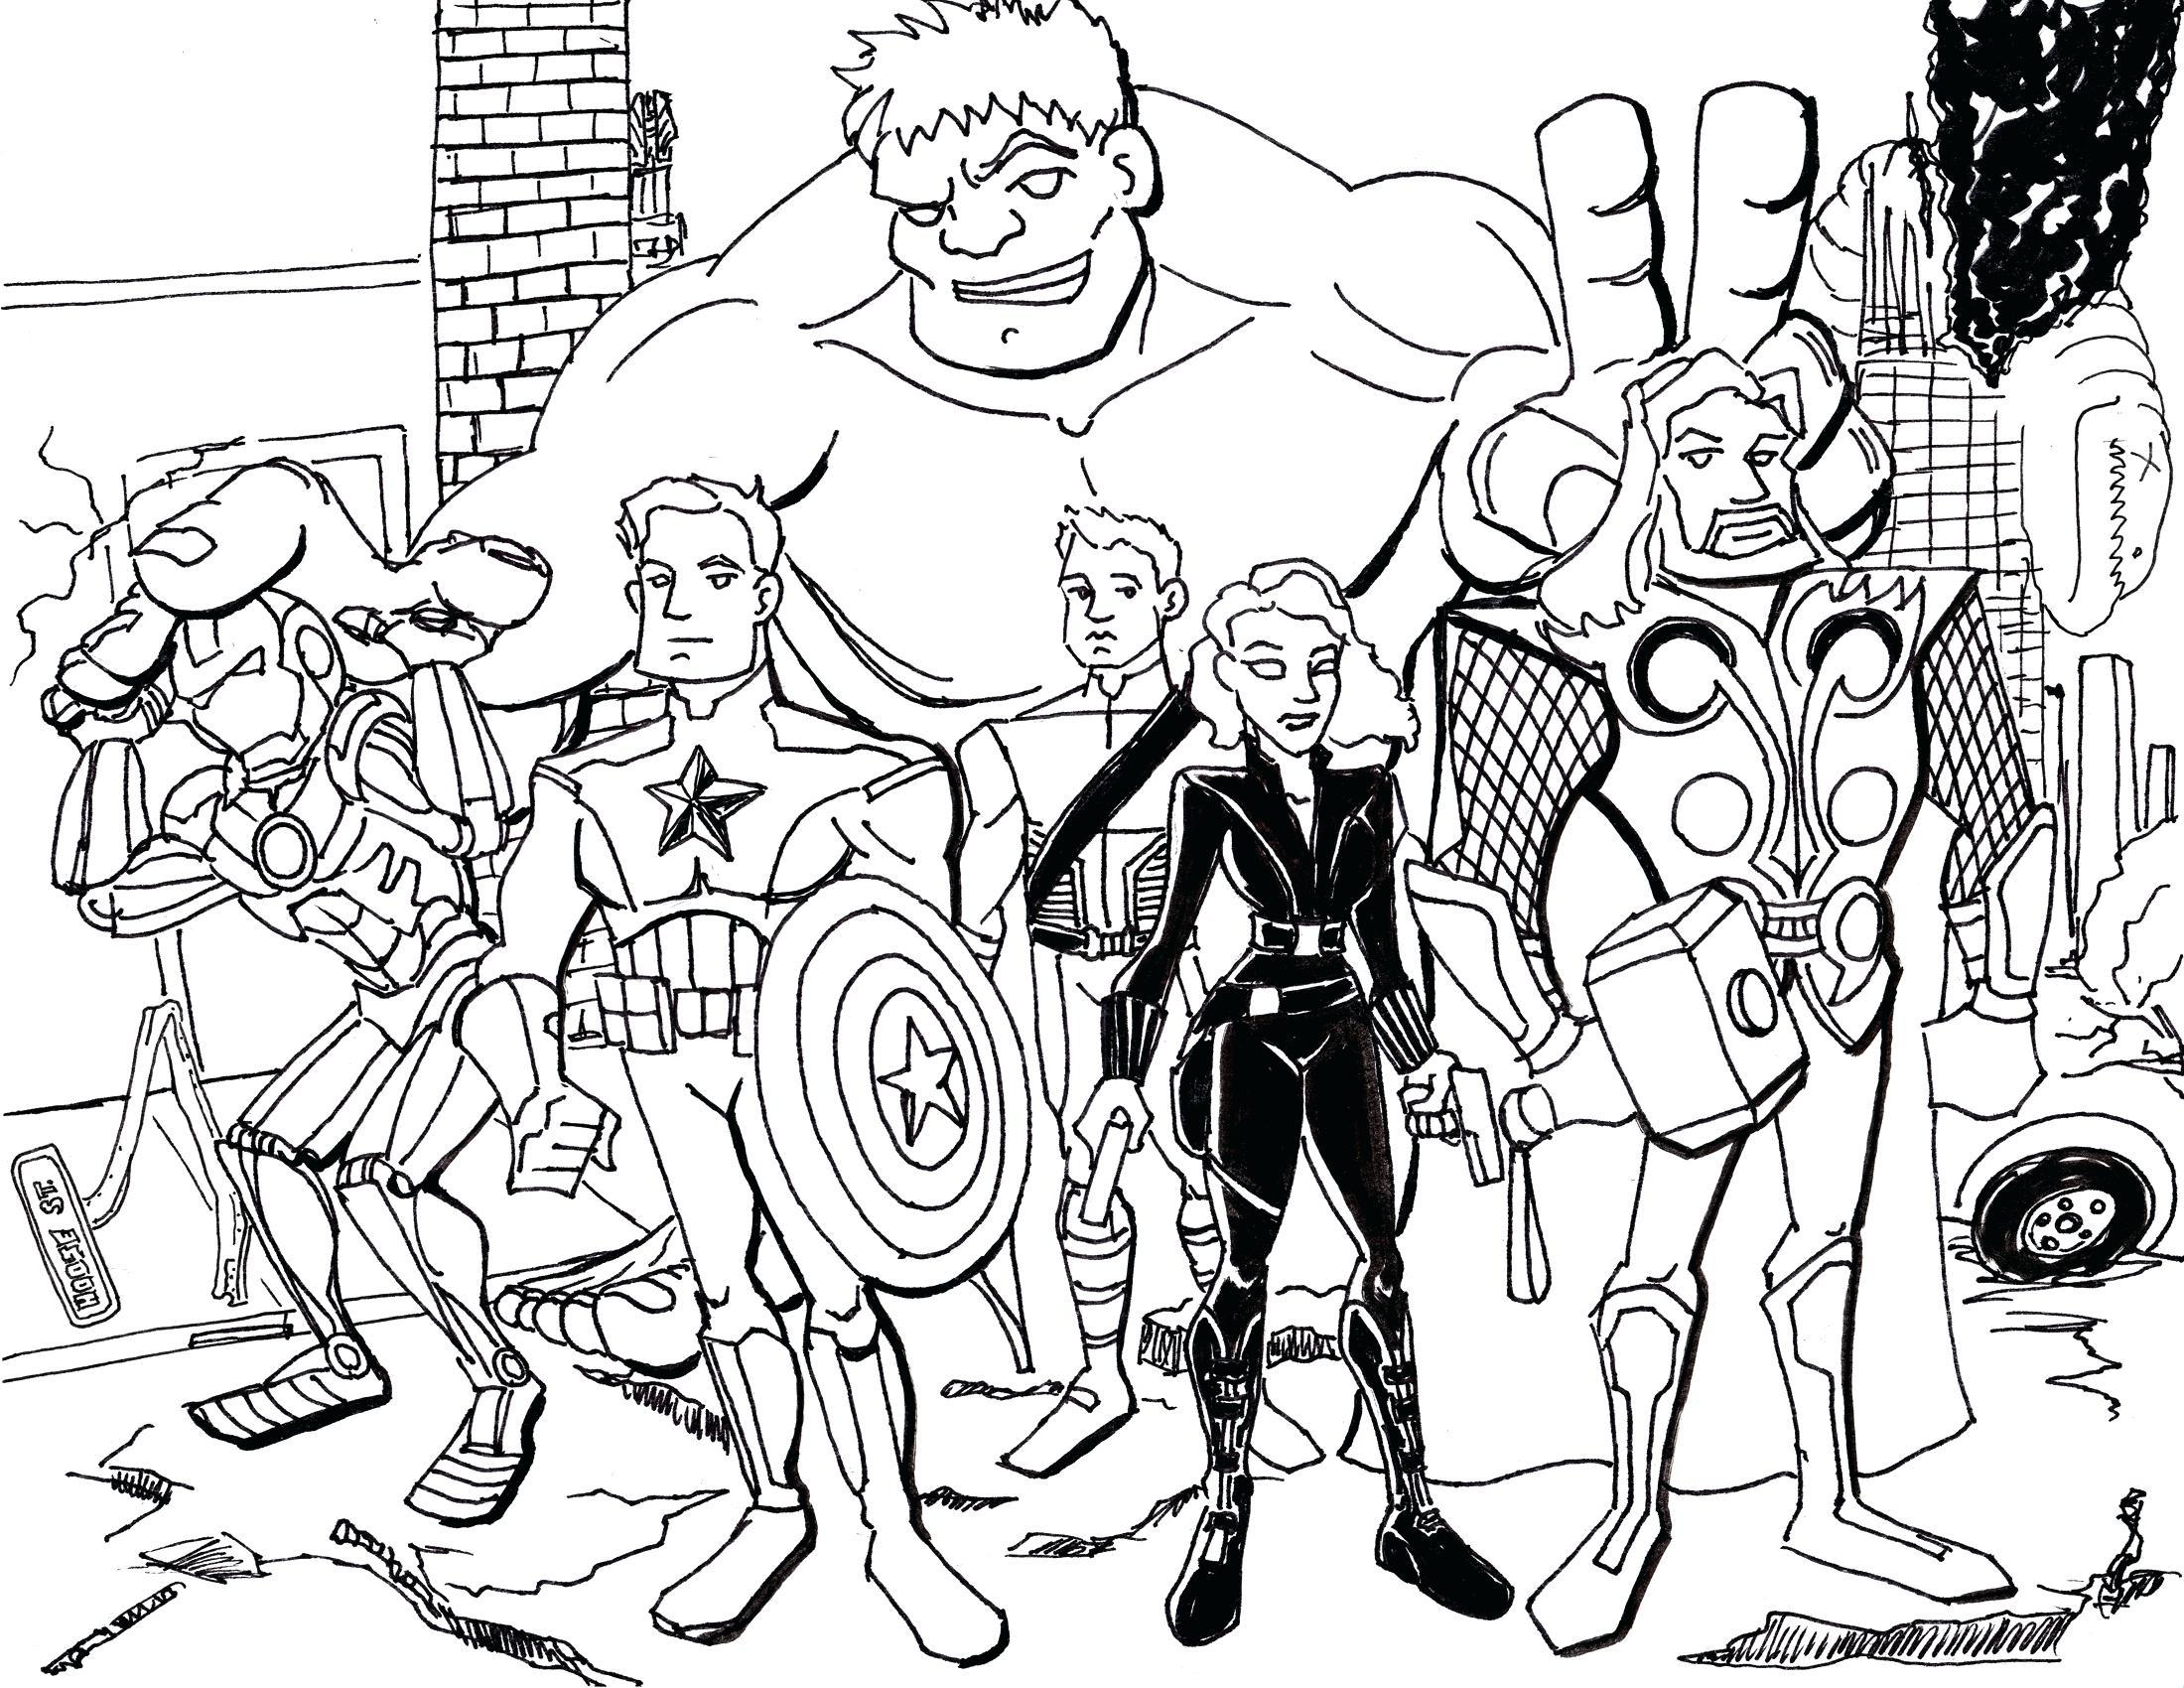 2200x1700 Coloring Pages Thanksgiving Disney Free Printable Marvel Superhero